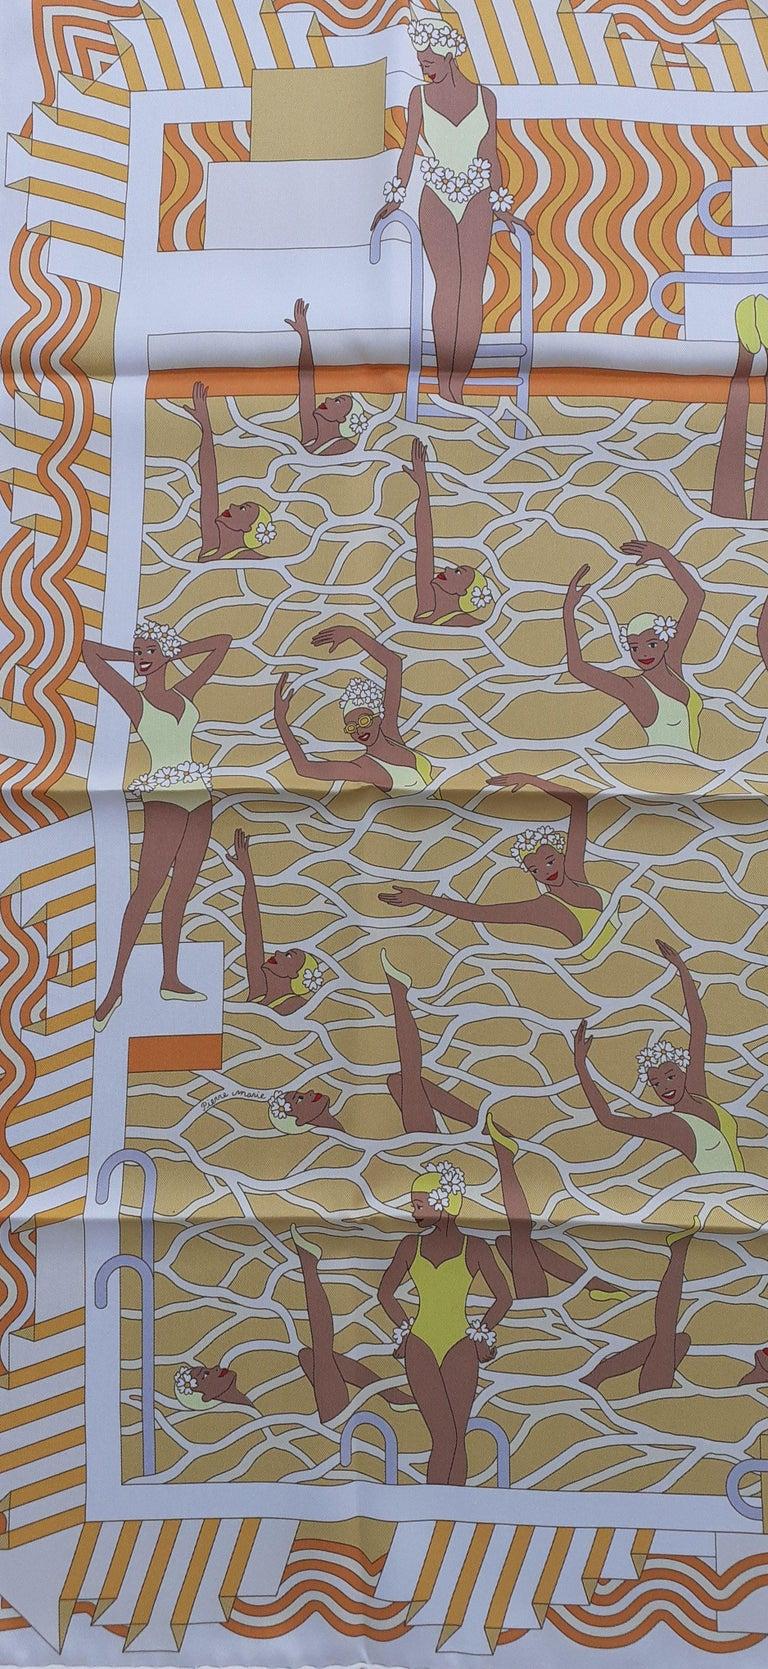 Hermès Silk Scarf Ballet Aquatique Pierre Marie Orange Yellow White 70 cm In New Condition For Sale In ., FR